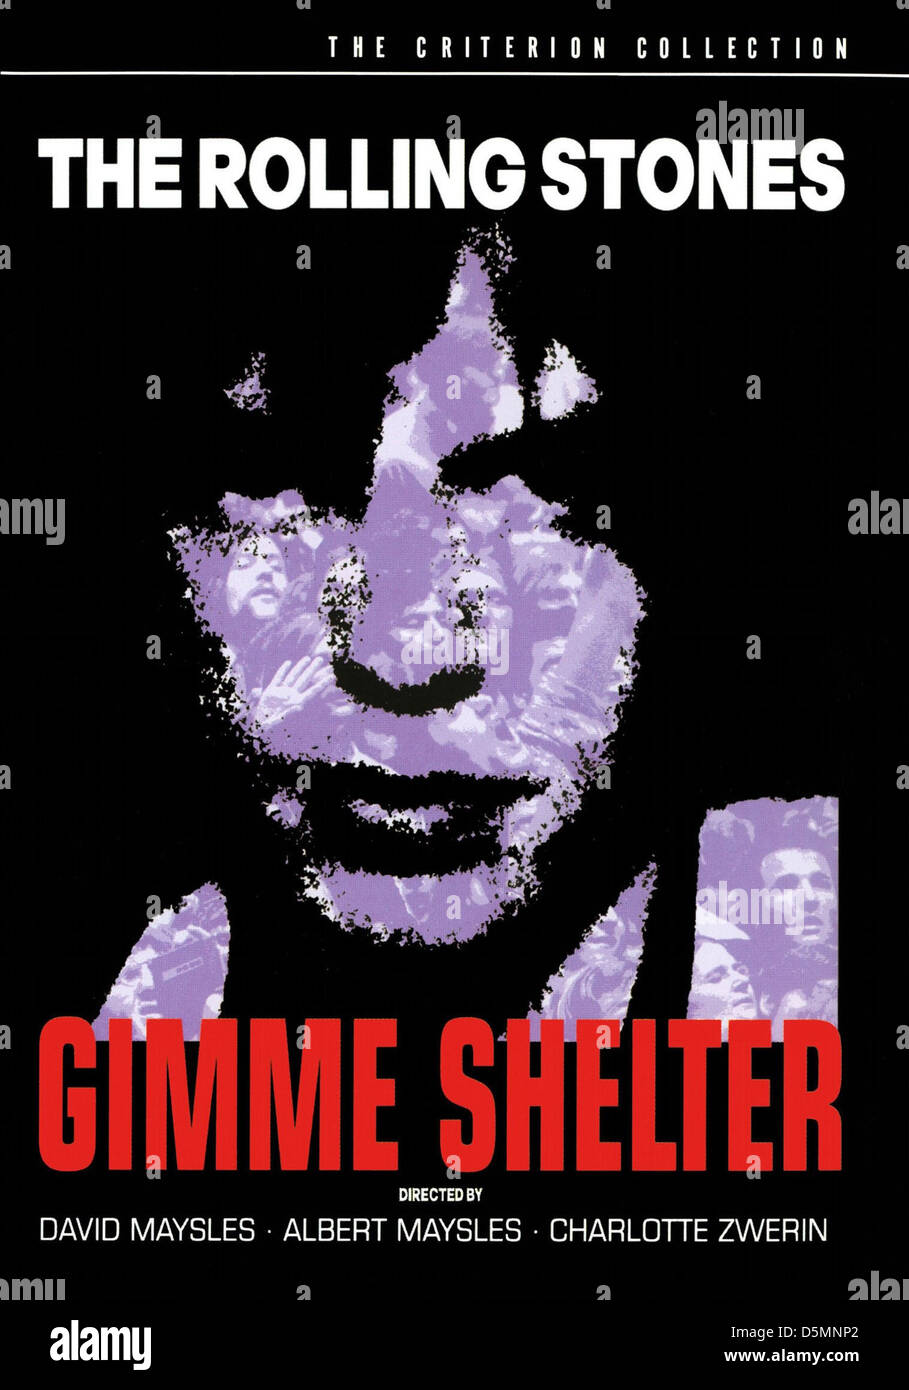 MICK JAGGER POSTER GIMME SHELTER (1970) - Stock Image